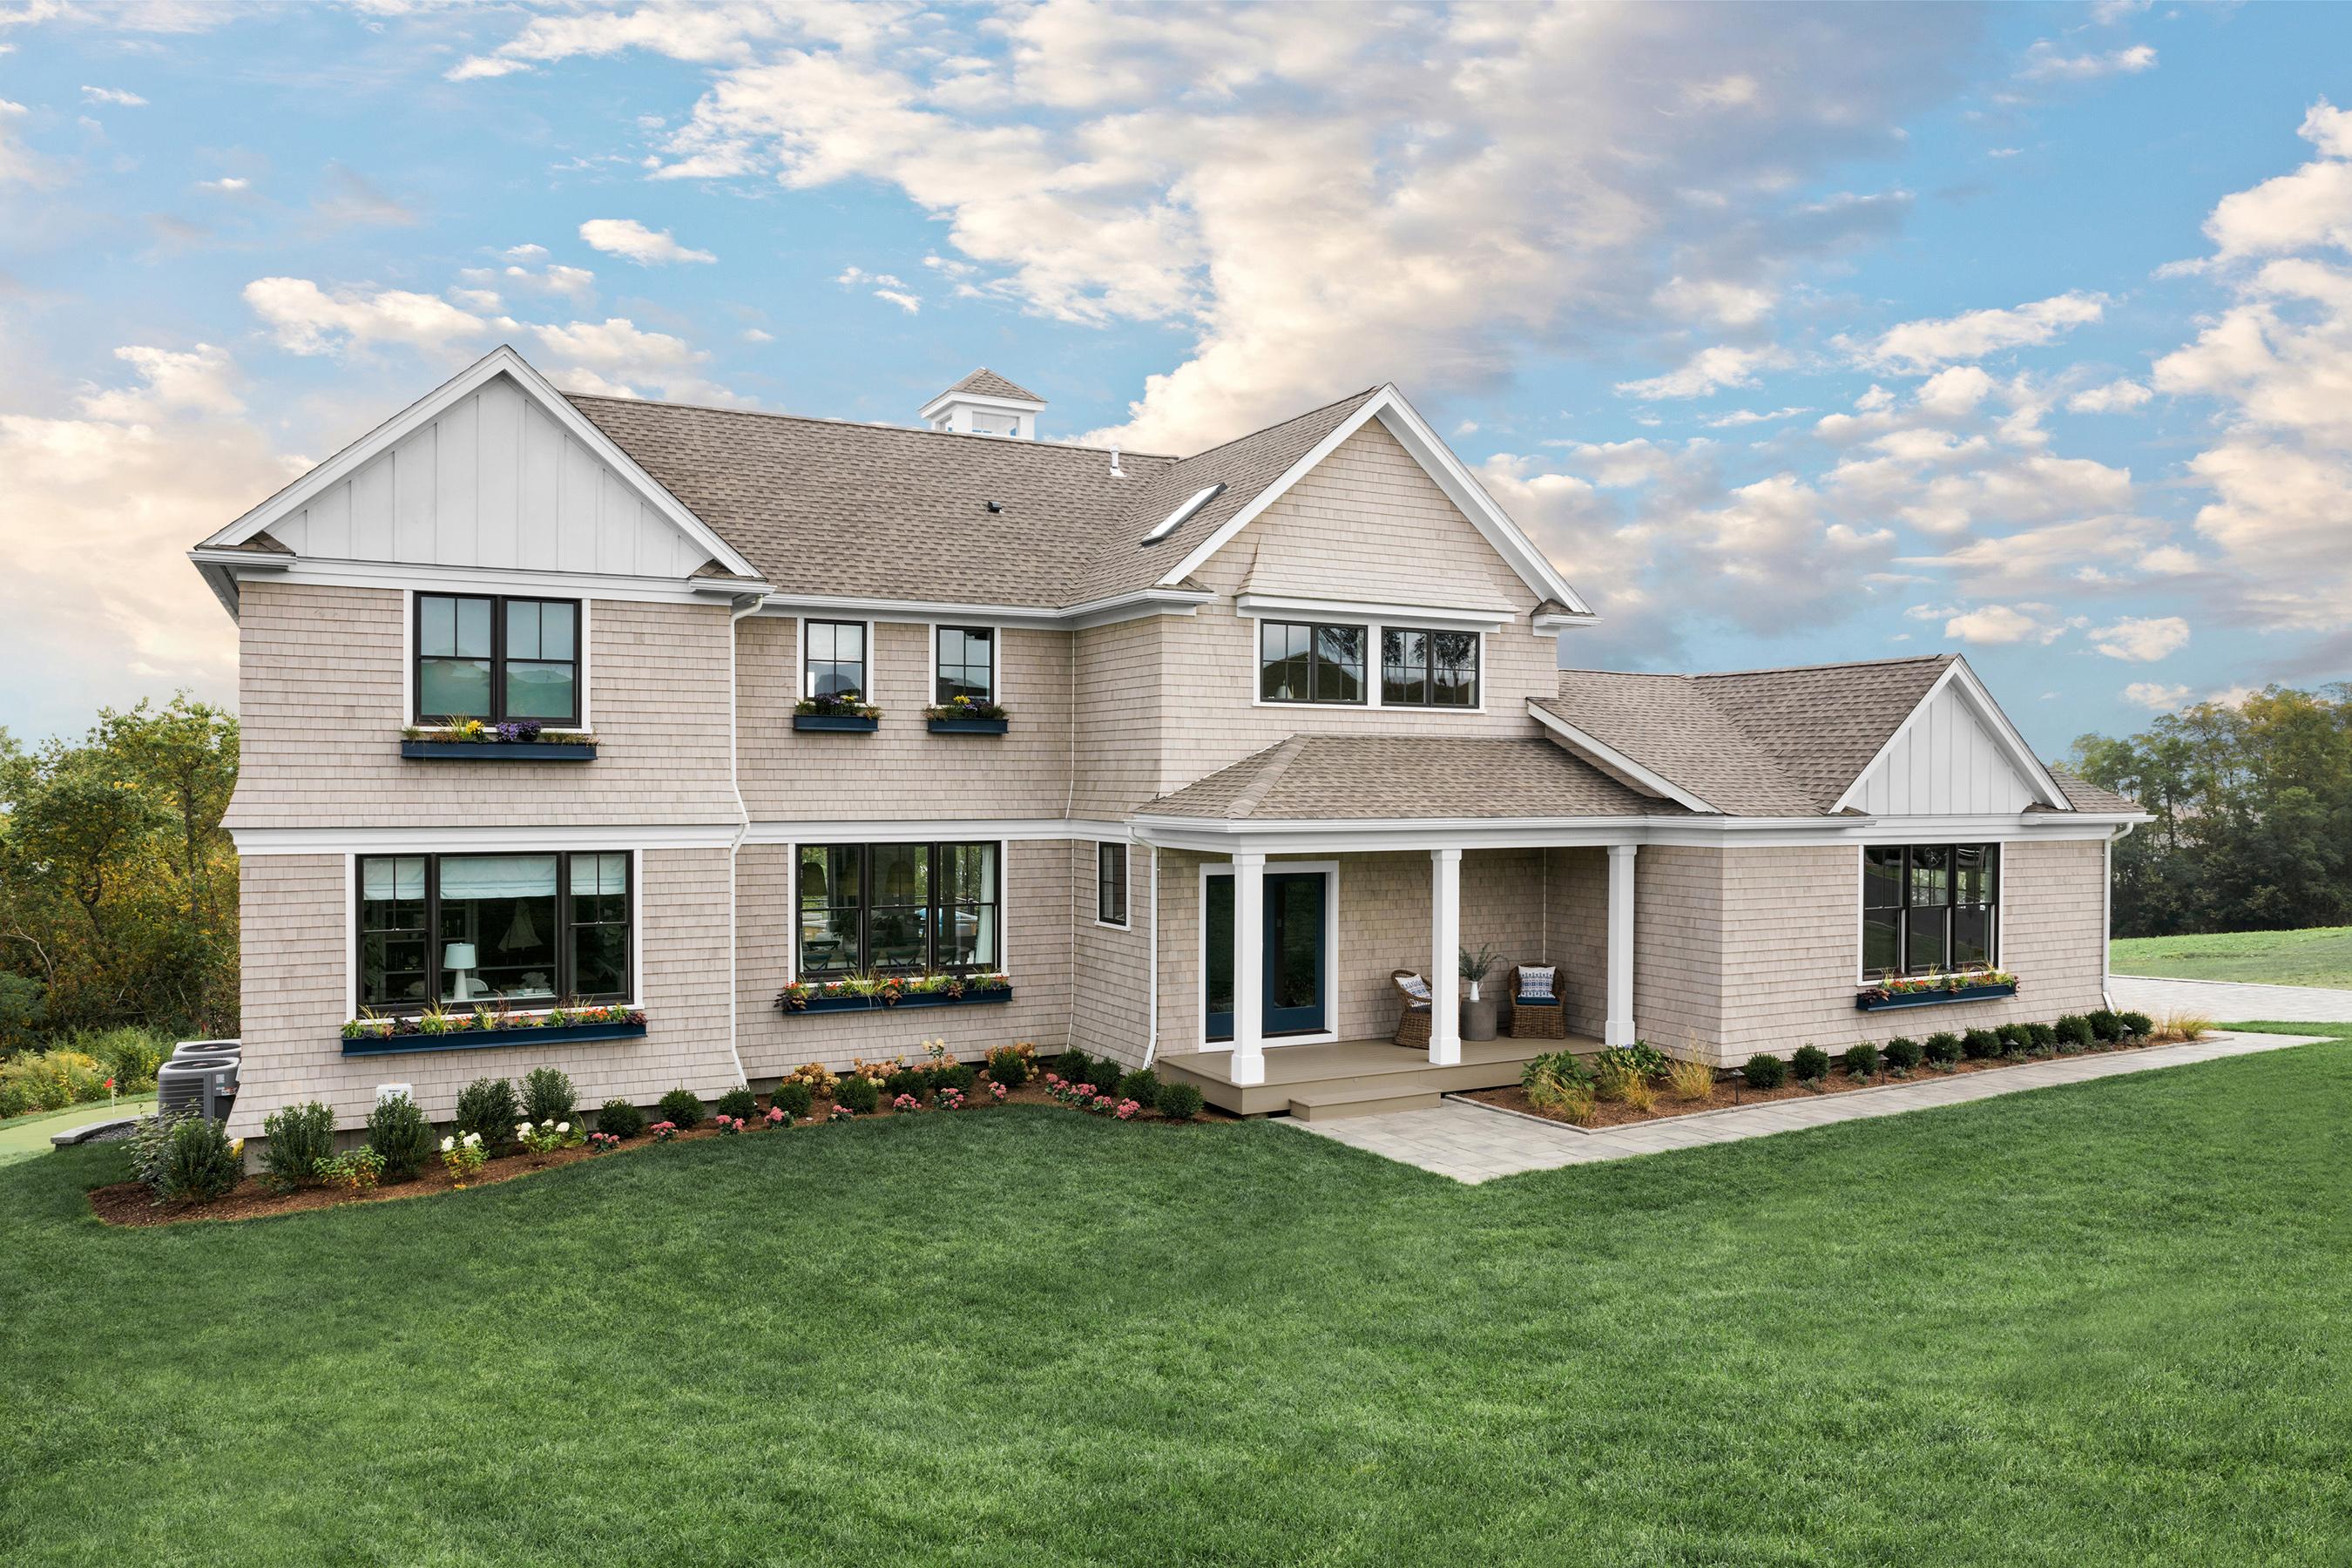 HGTV Dream Home 2021 Front Yard